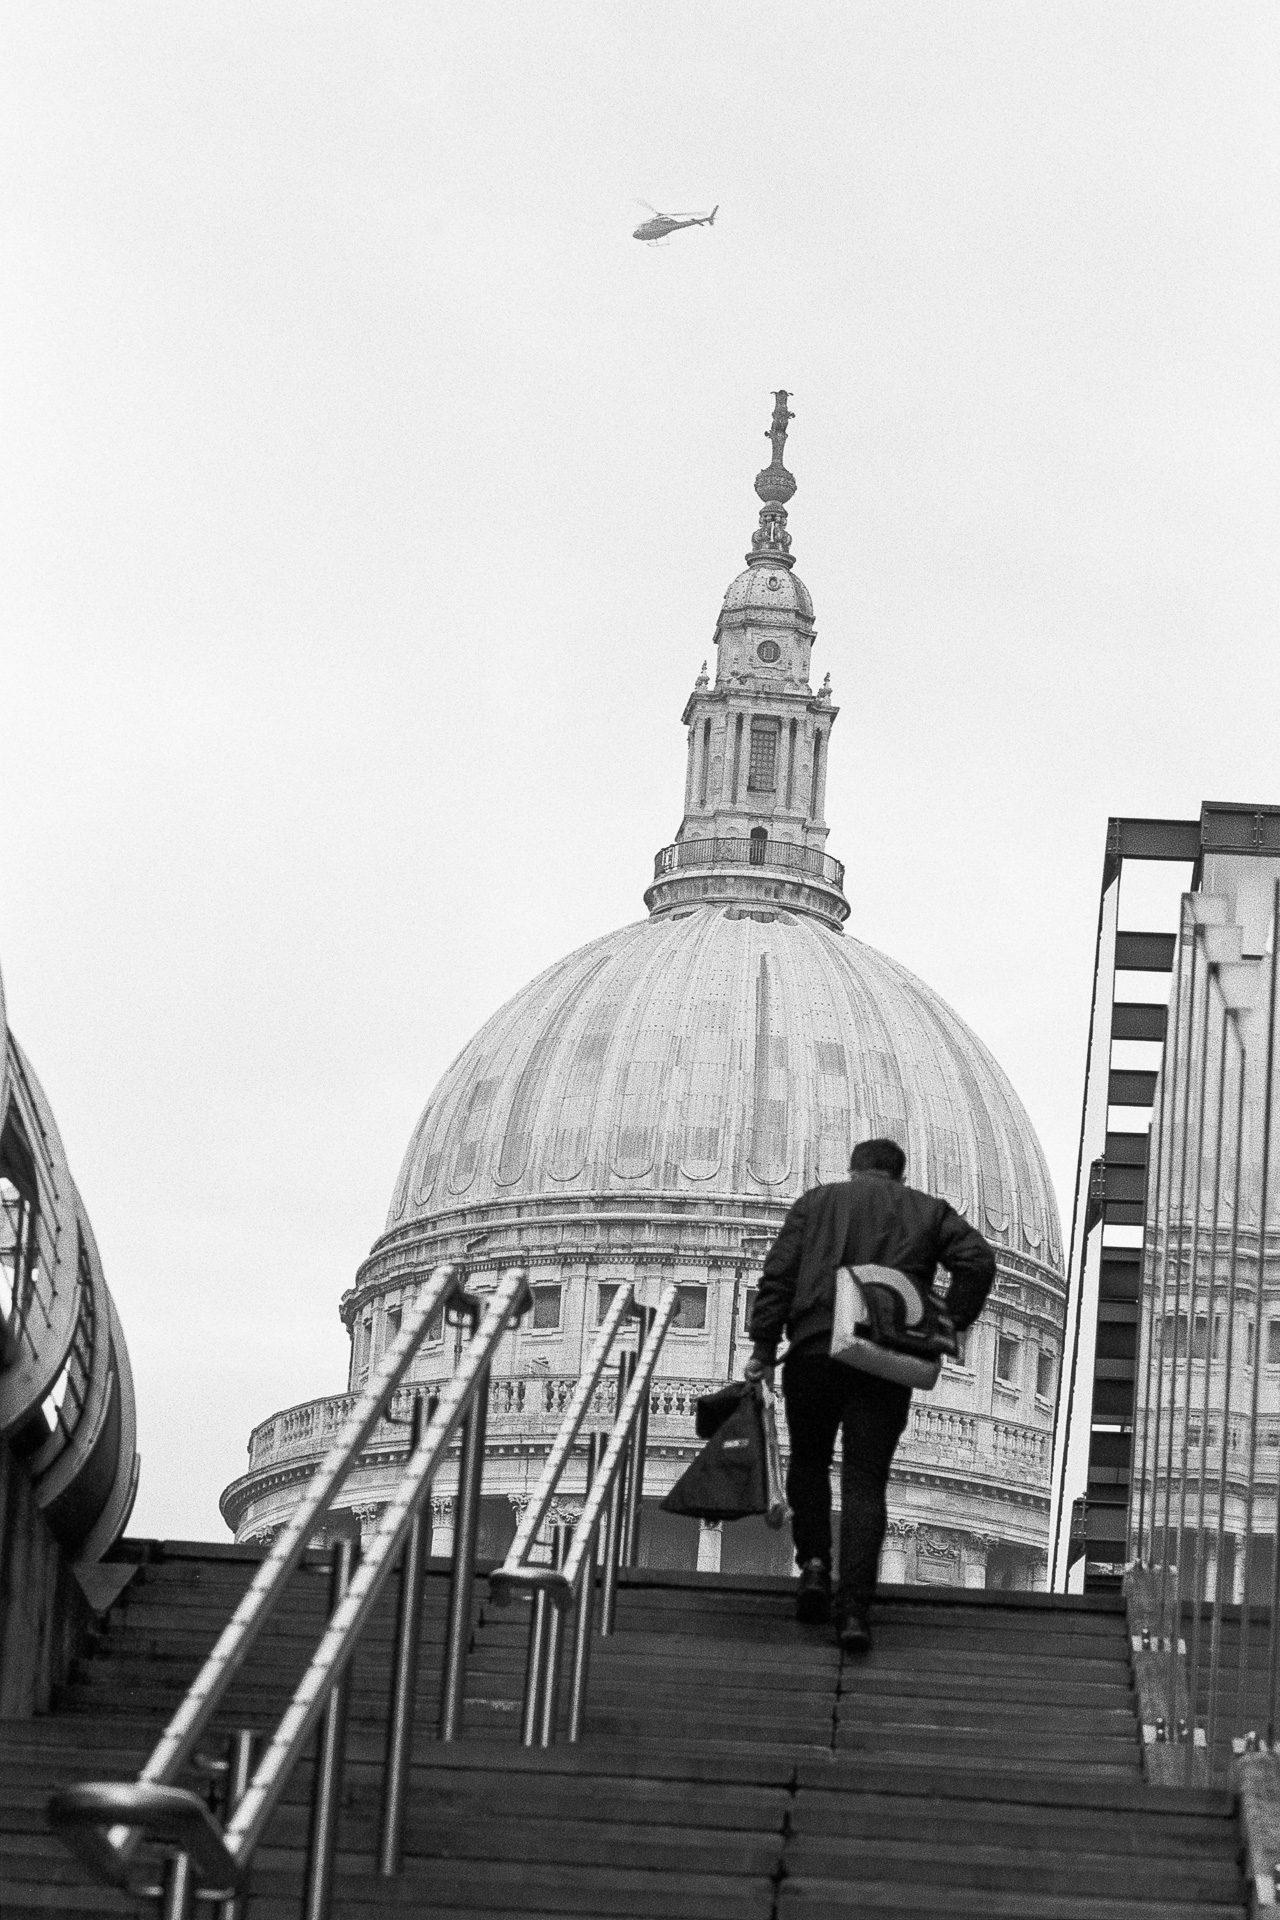 @paulasmithphoto Steps near St Paul's, London Camera - Canon EOS 3 Film - @Ilfordphoto FP4 EI125 Developer - Ilfotec HC 1+31 for 8mins #filmpeople shots for this week's #ilfordphoto #fridayfavourites.